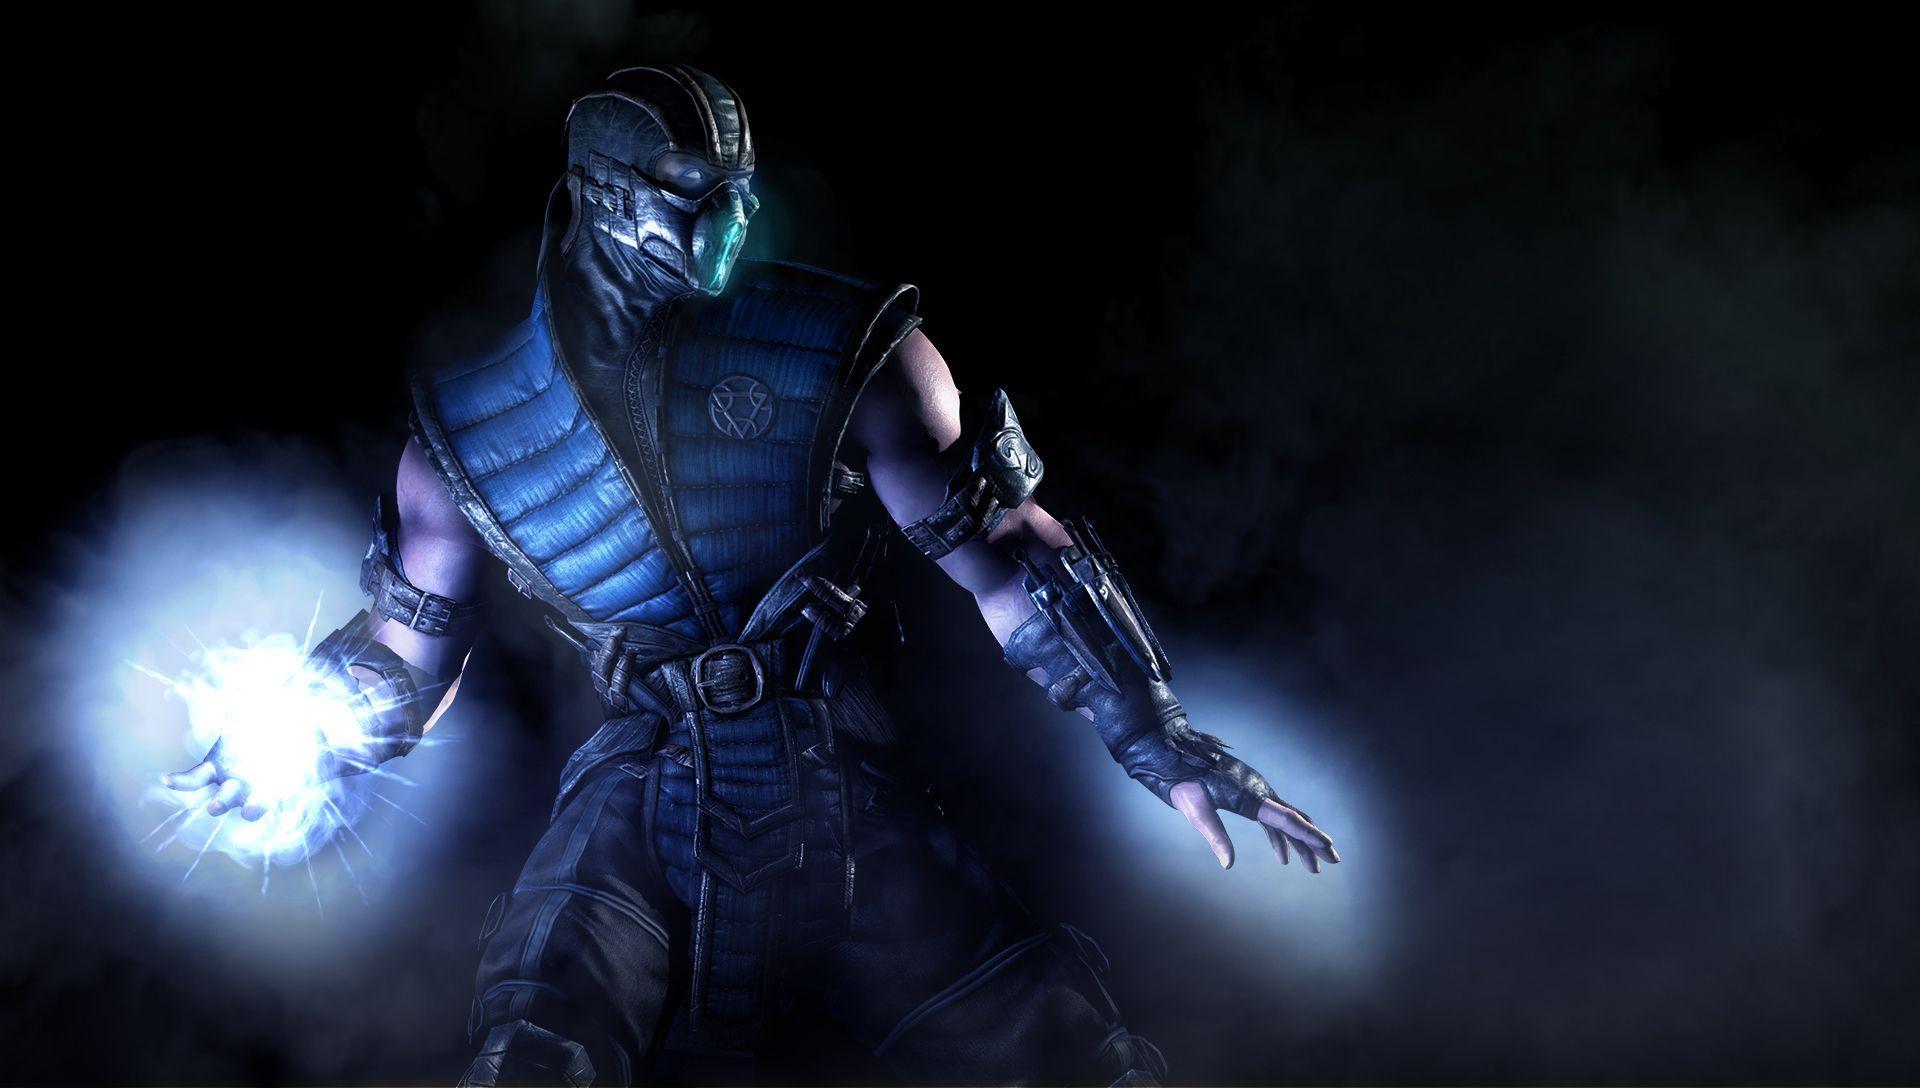 Mortal Kombat Sub-Zero Wallpapers - Top